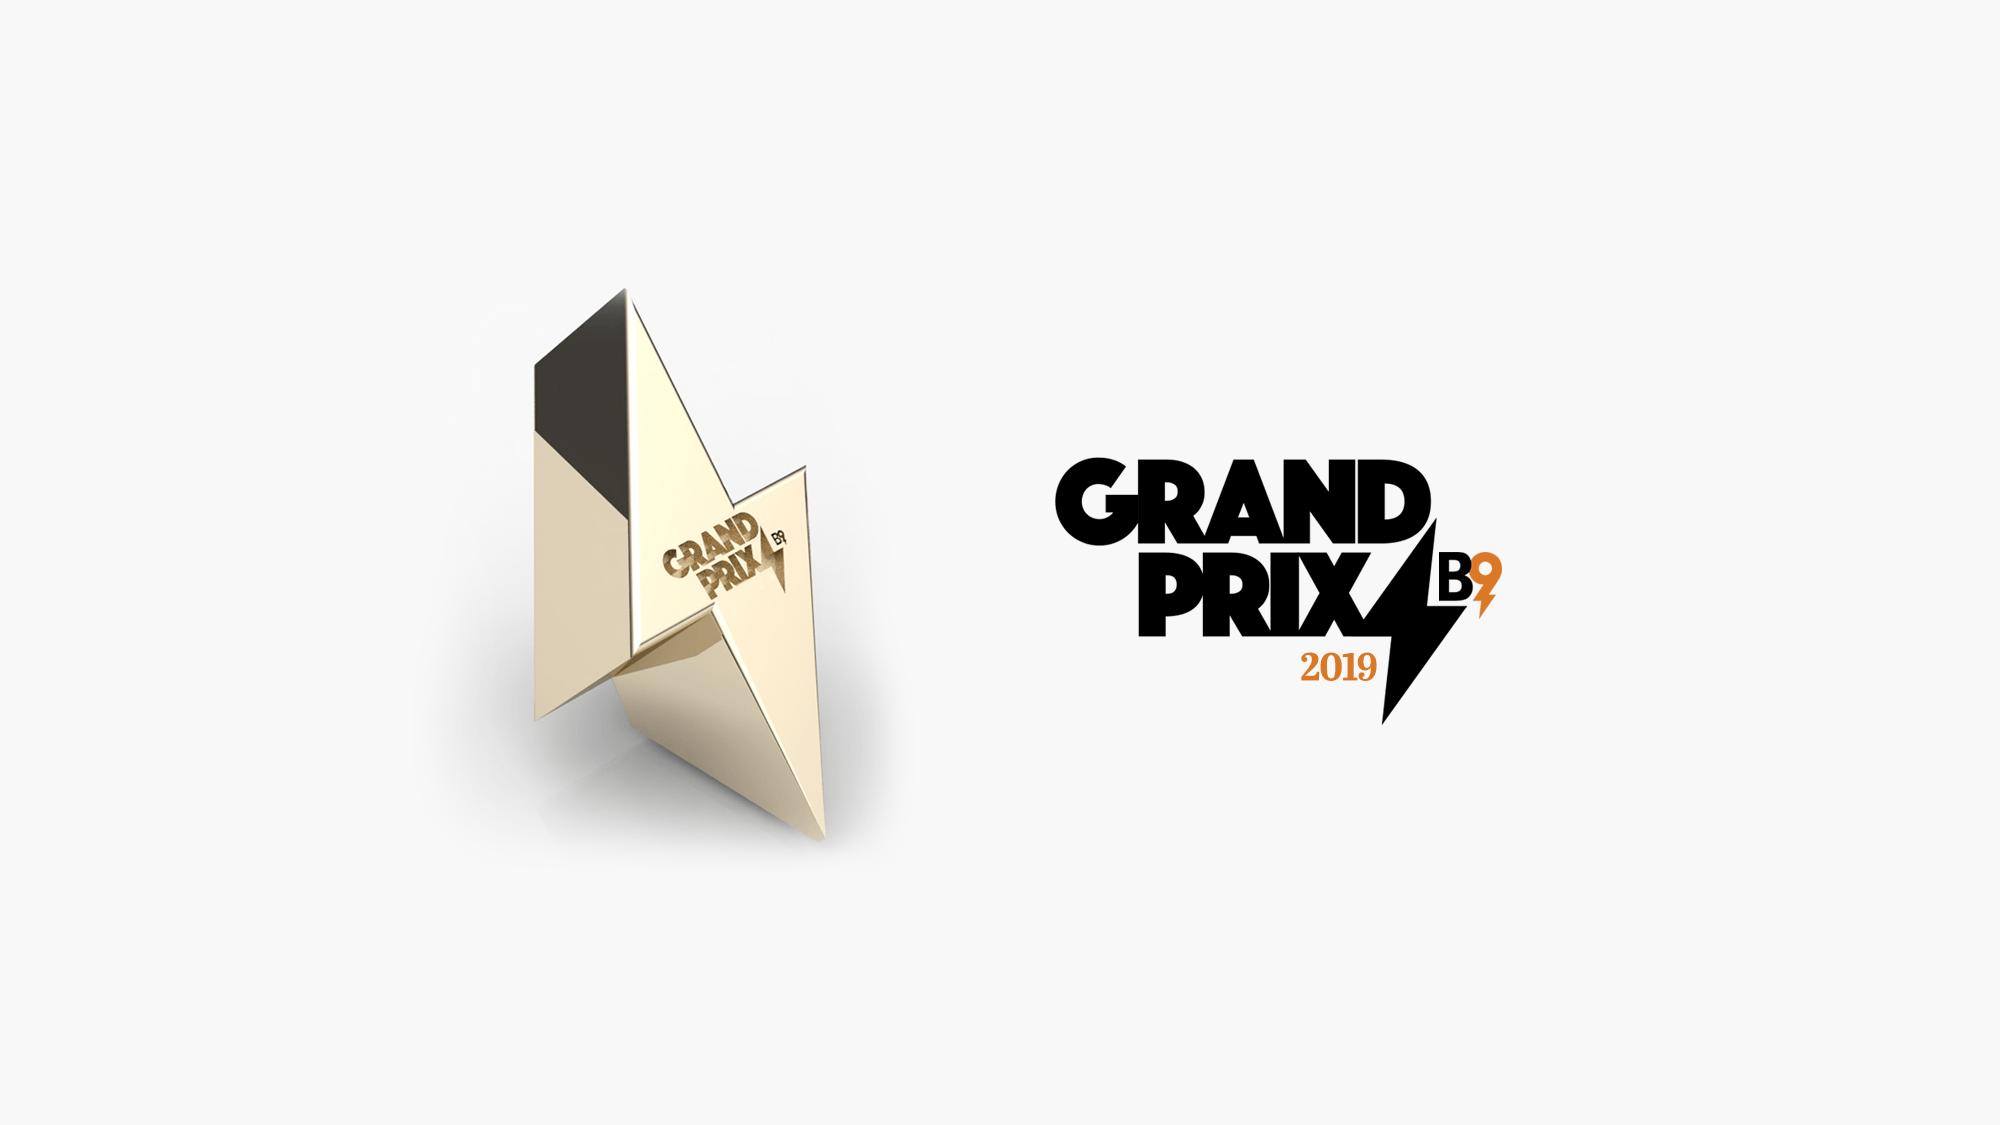 B9 Grand Prix 2019